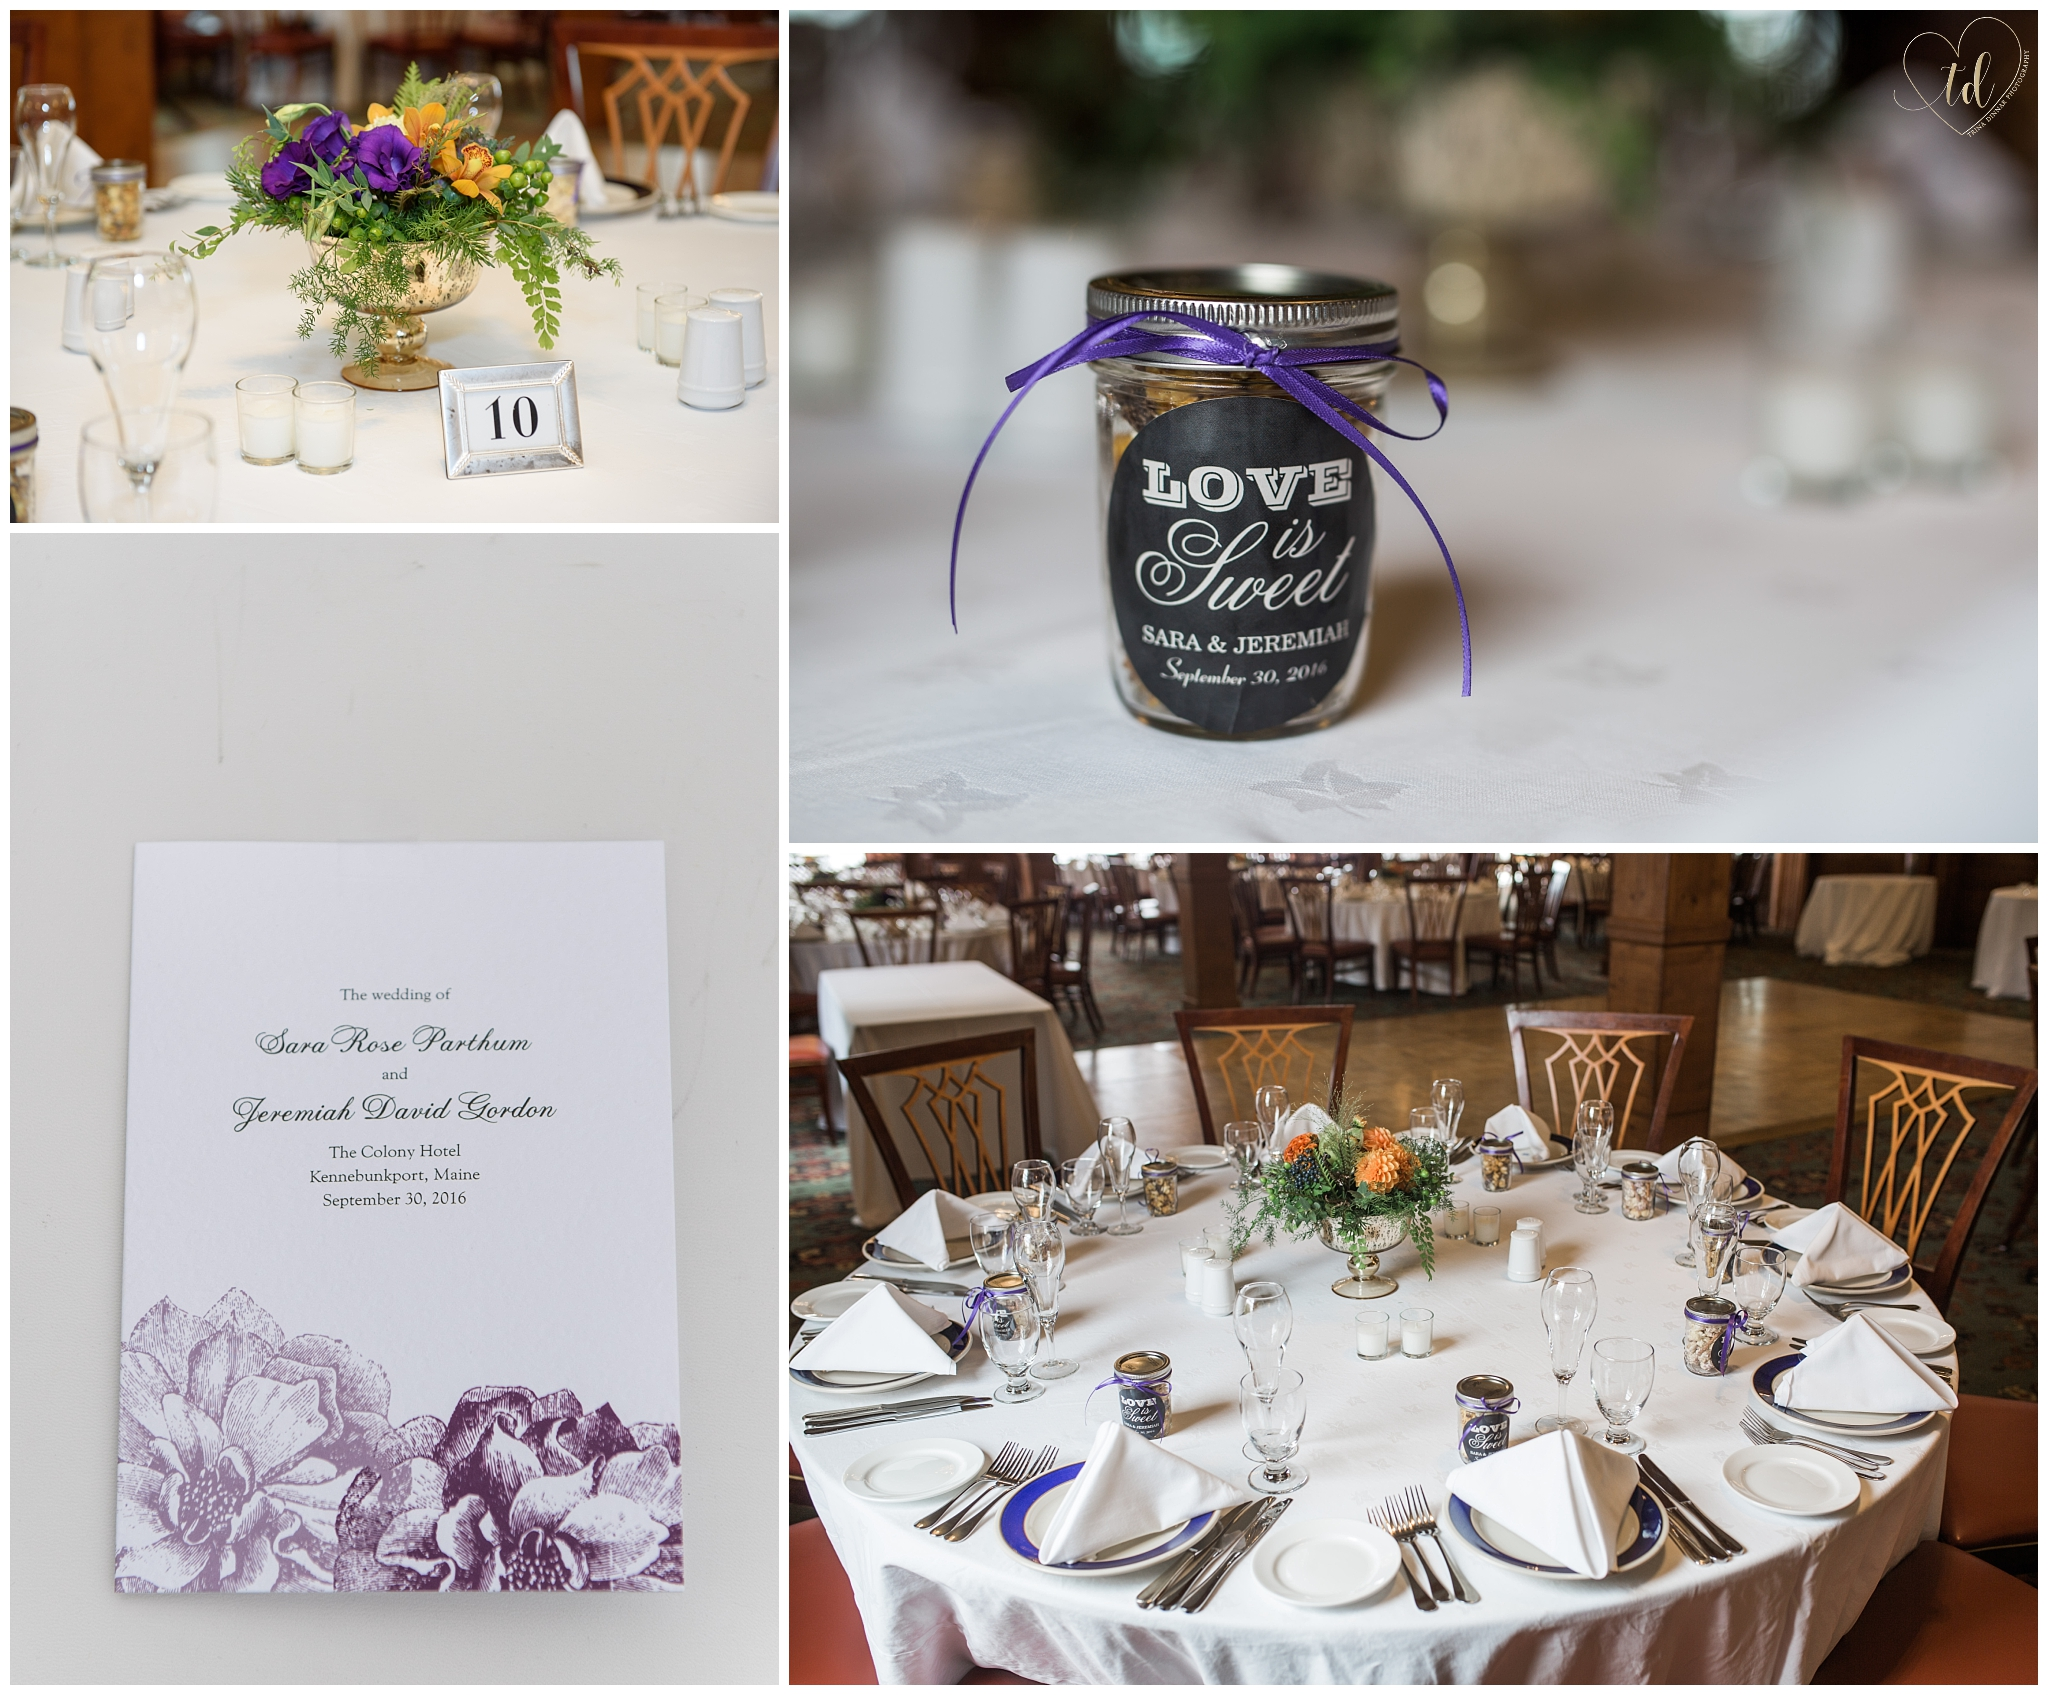 The Colony Hotel Wedding Reception